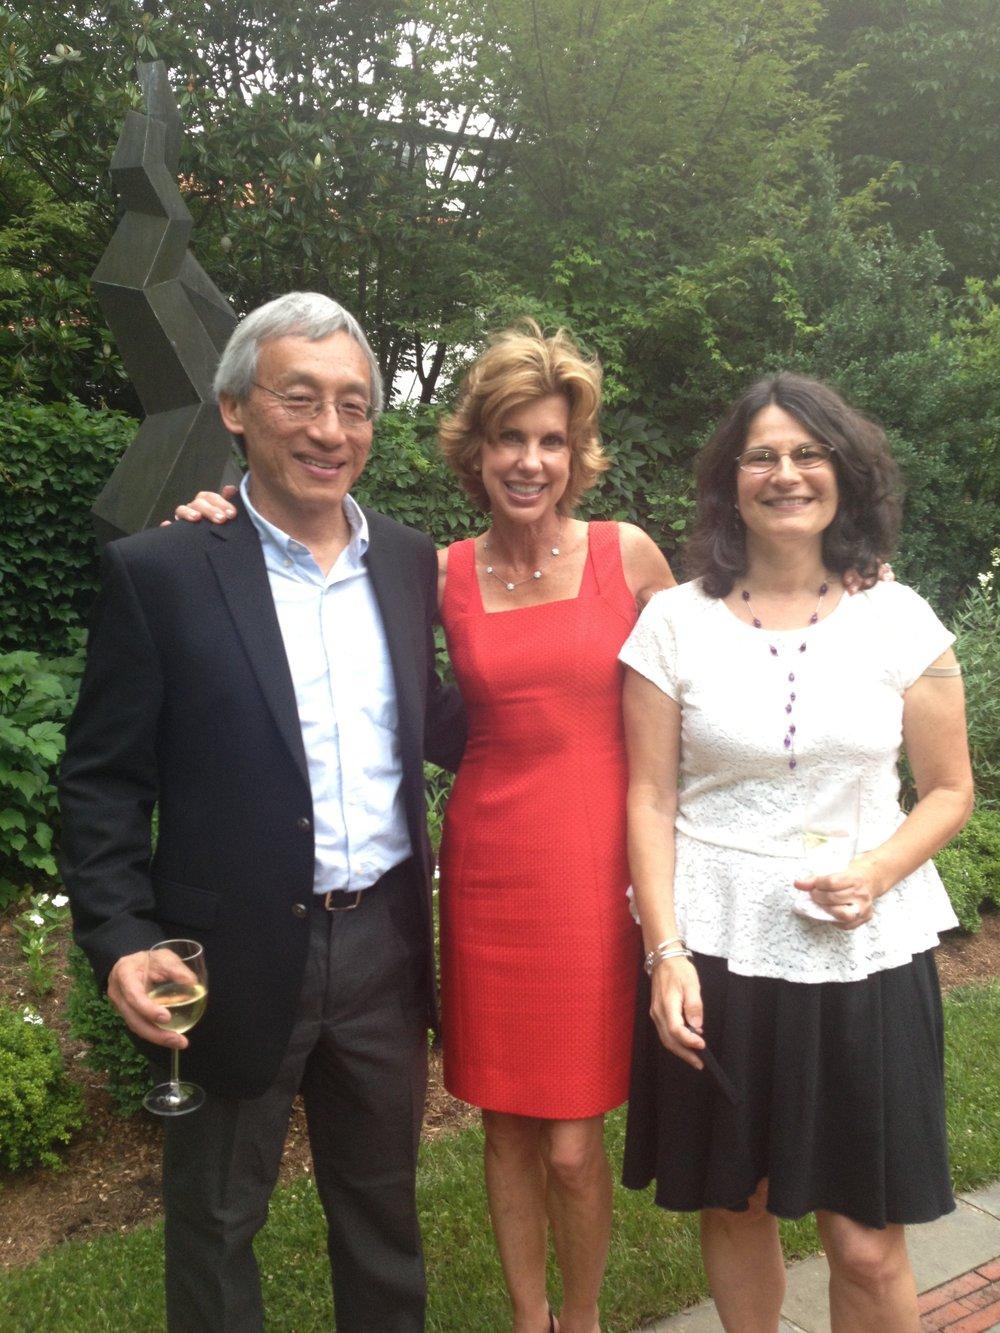 Channing J. Der, PhD, Laurie MacCaskill, Adrienne D. Cox, PhD